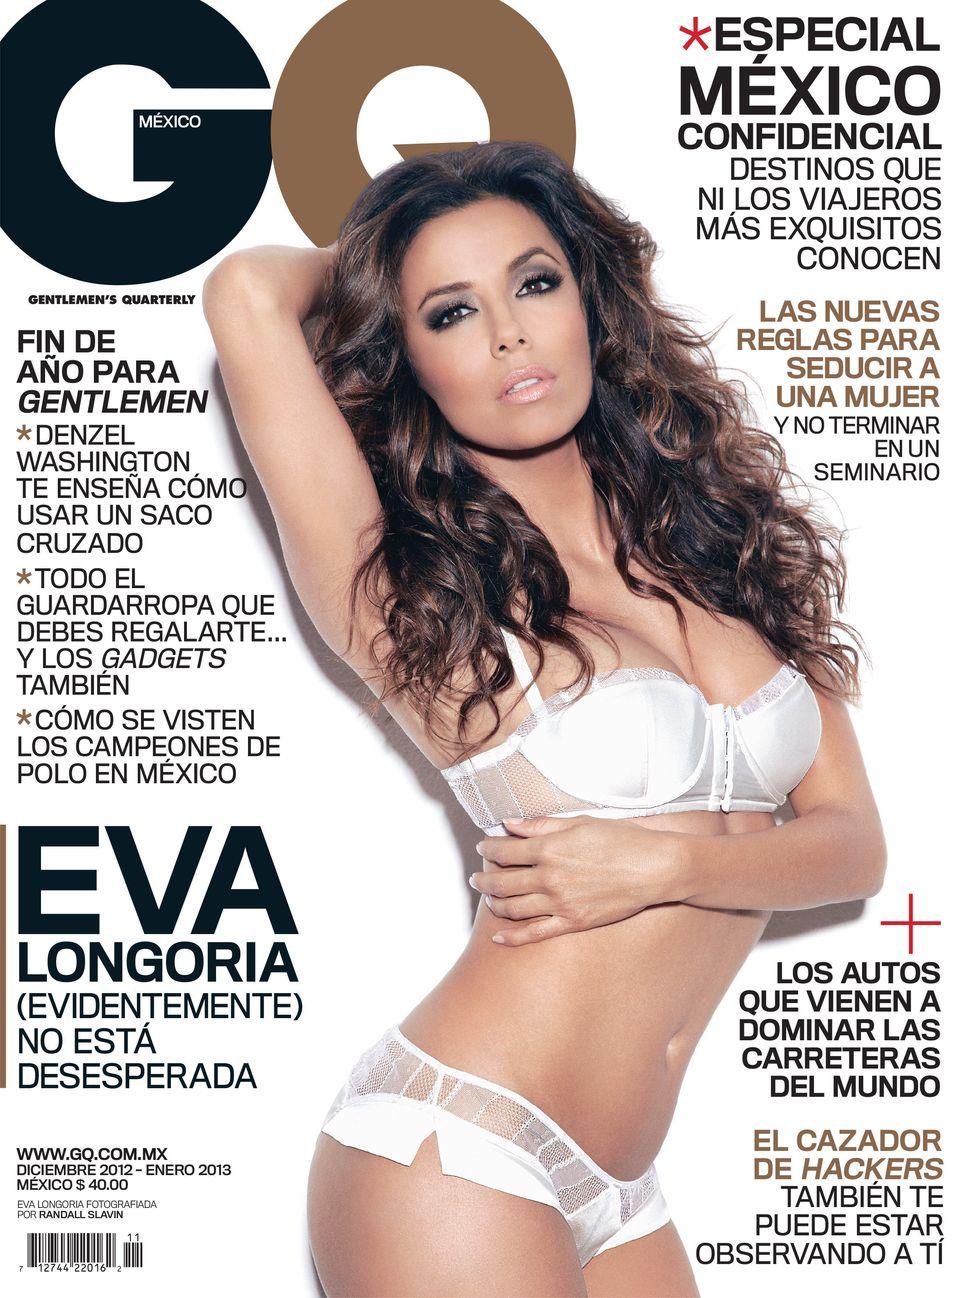 "<a href=""http://www.gq.com.mx/articulos/eva-longoria-en-gq-mexico/1448"" target=""_hplink"">GQ Mexico</a>"